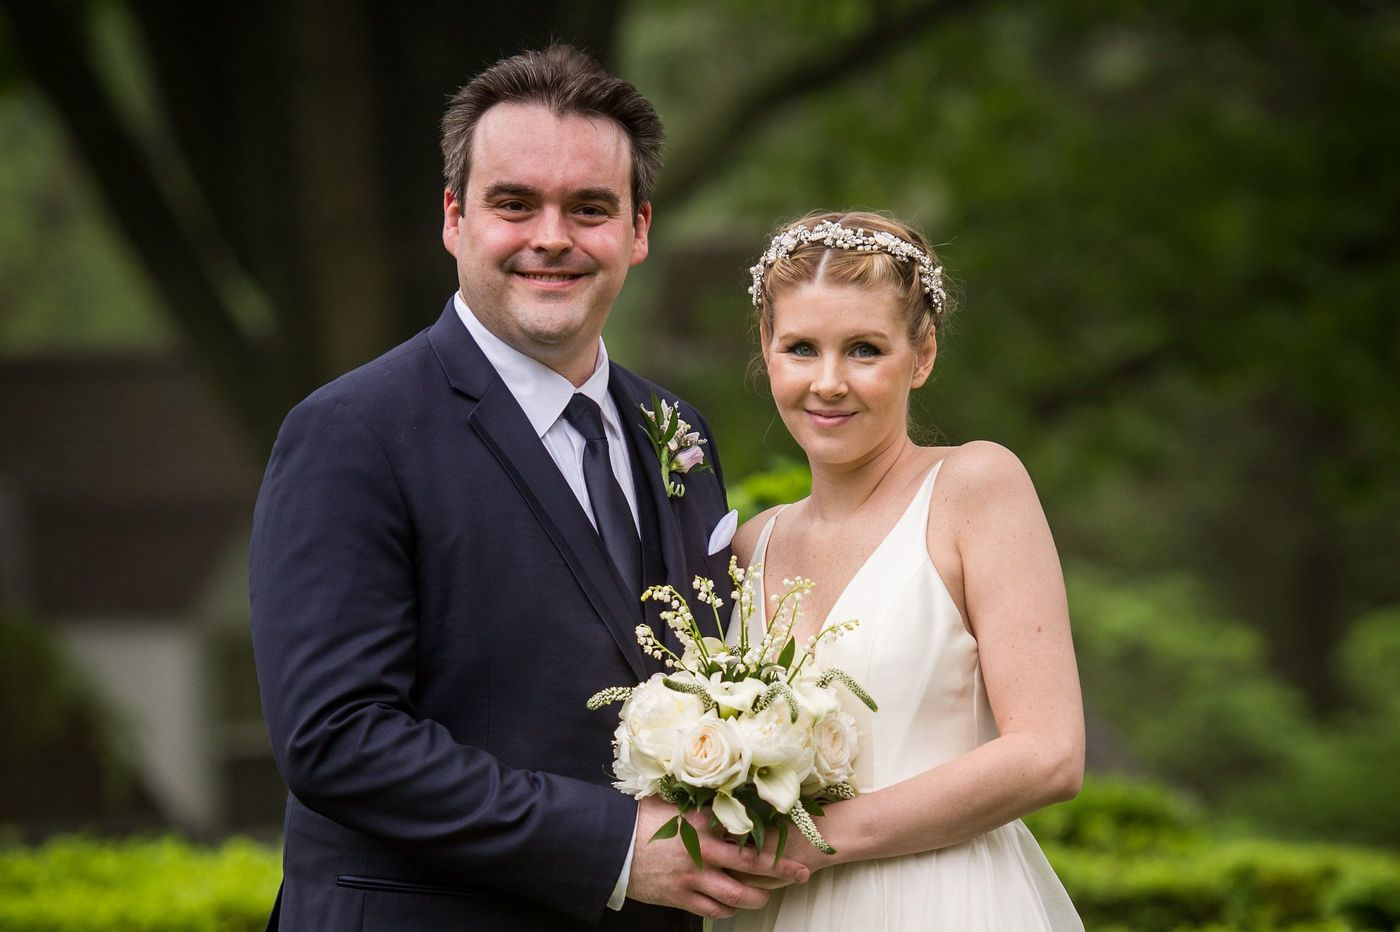 Philadelphia weddings: Kerry Hansen and Matthew Furey